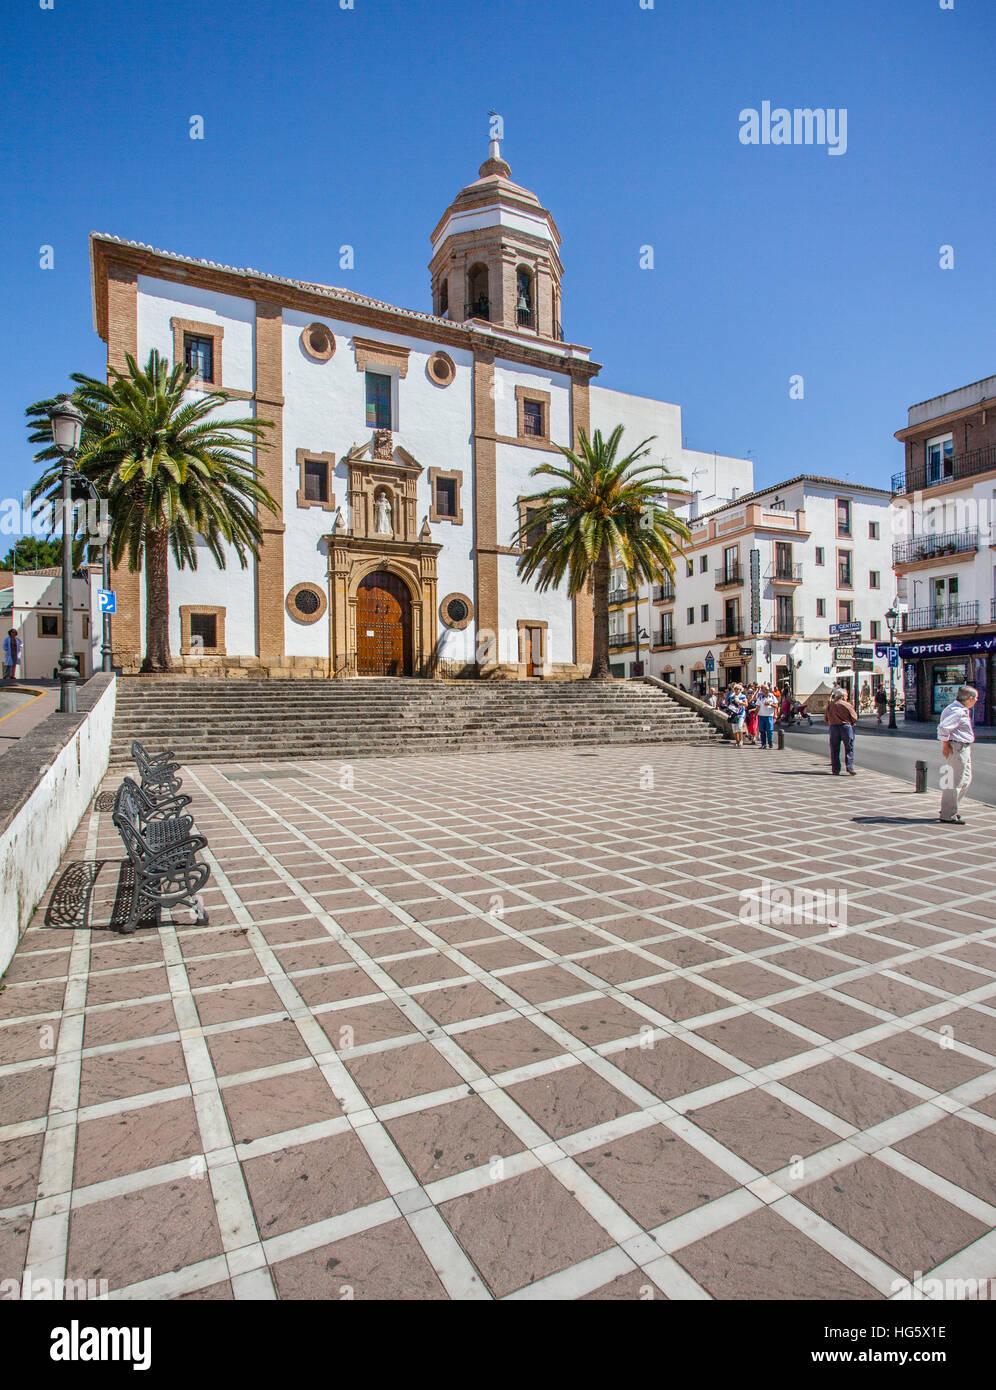 Espagne, Andalousie, province de Malaga, Ronda, 16e siècle Iglesia de Nuestra Señora de la Merced Photo Stock